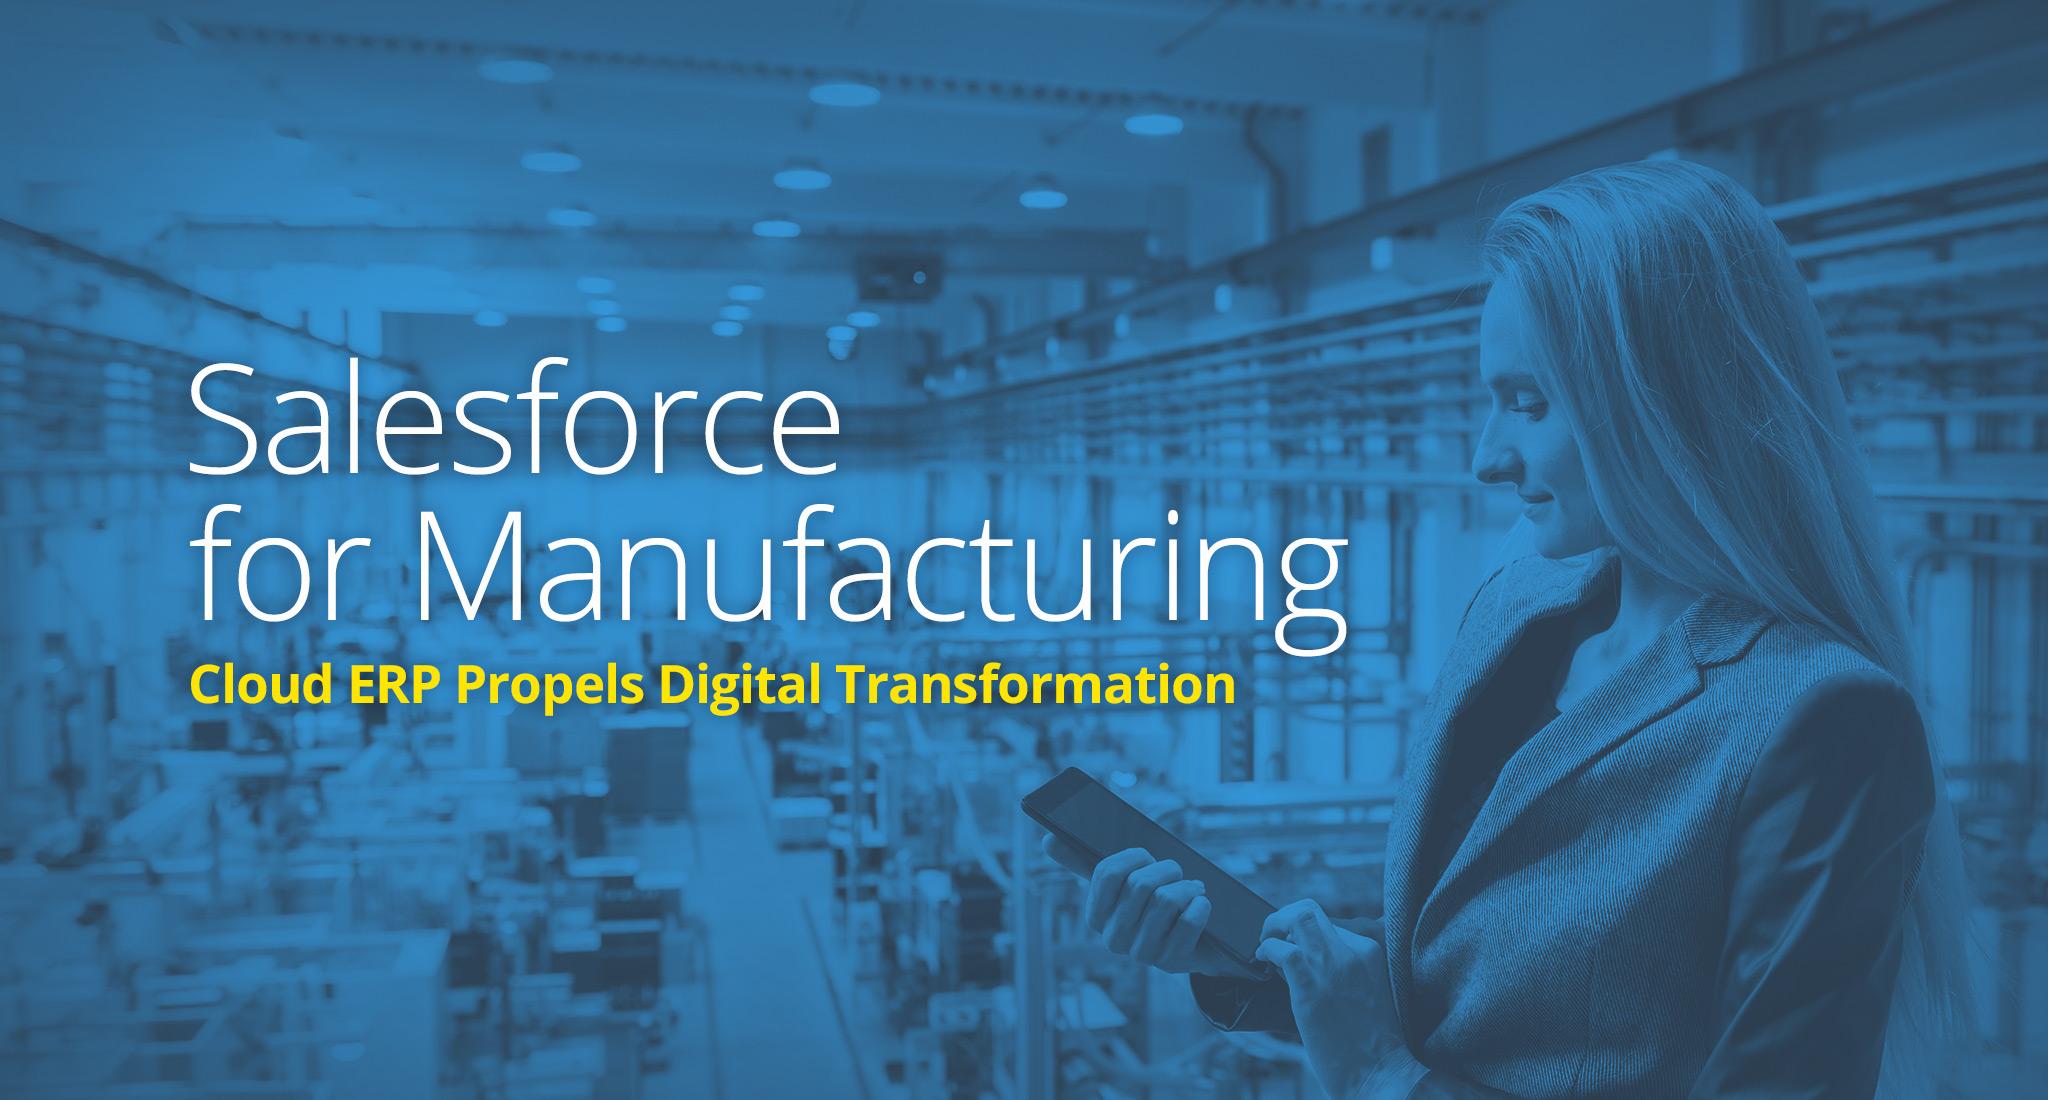 Salesforce-for-Manufacturing-Cloud-ERP-Propels-Digital-Transformation